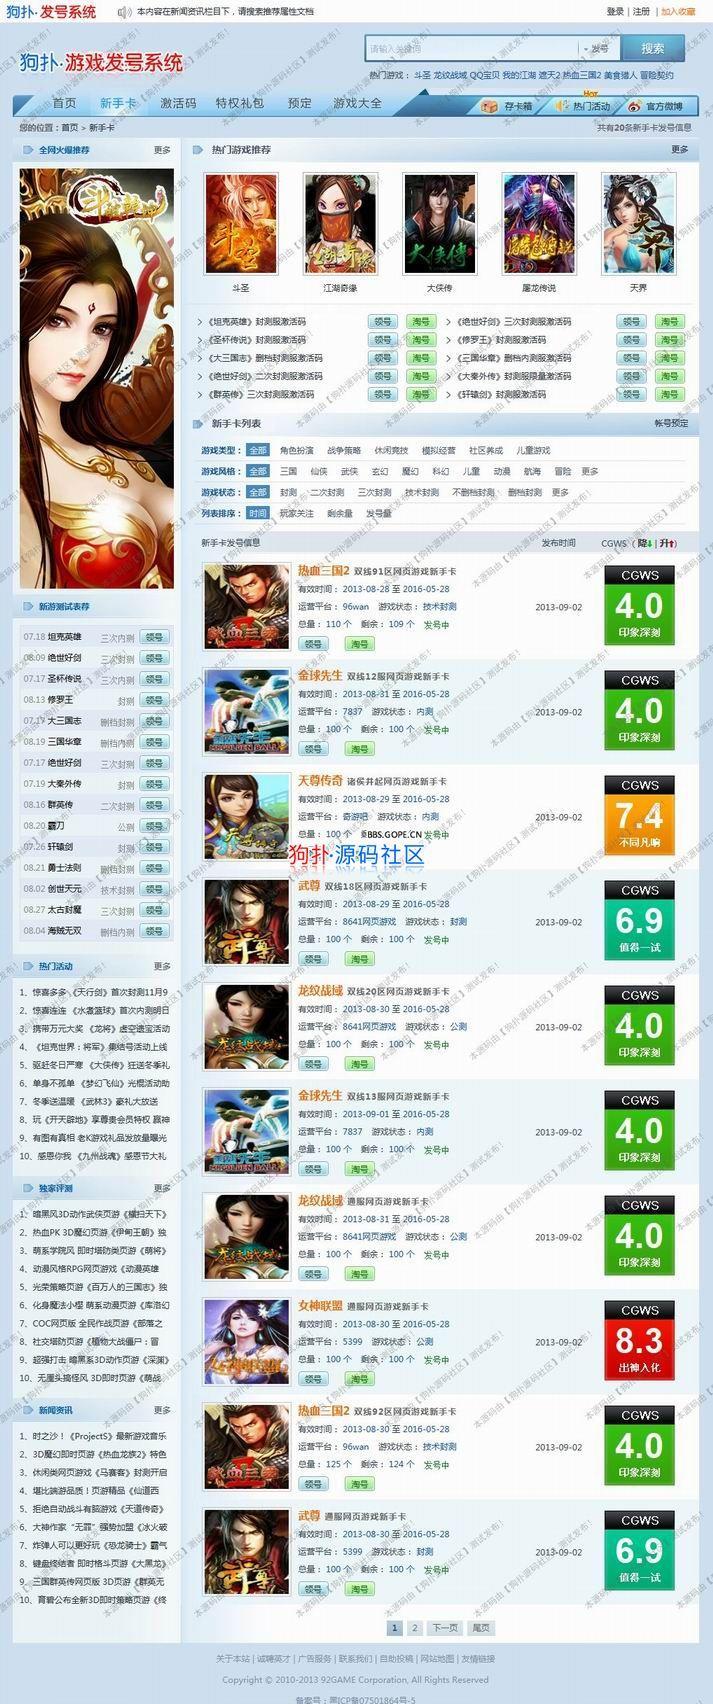 【php】仿新浪游戏发号系统源码,帝国CMS内核